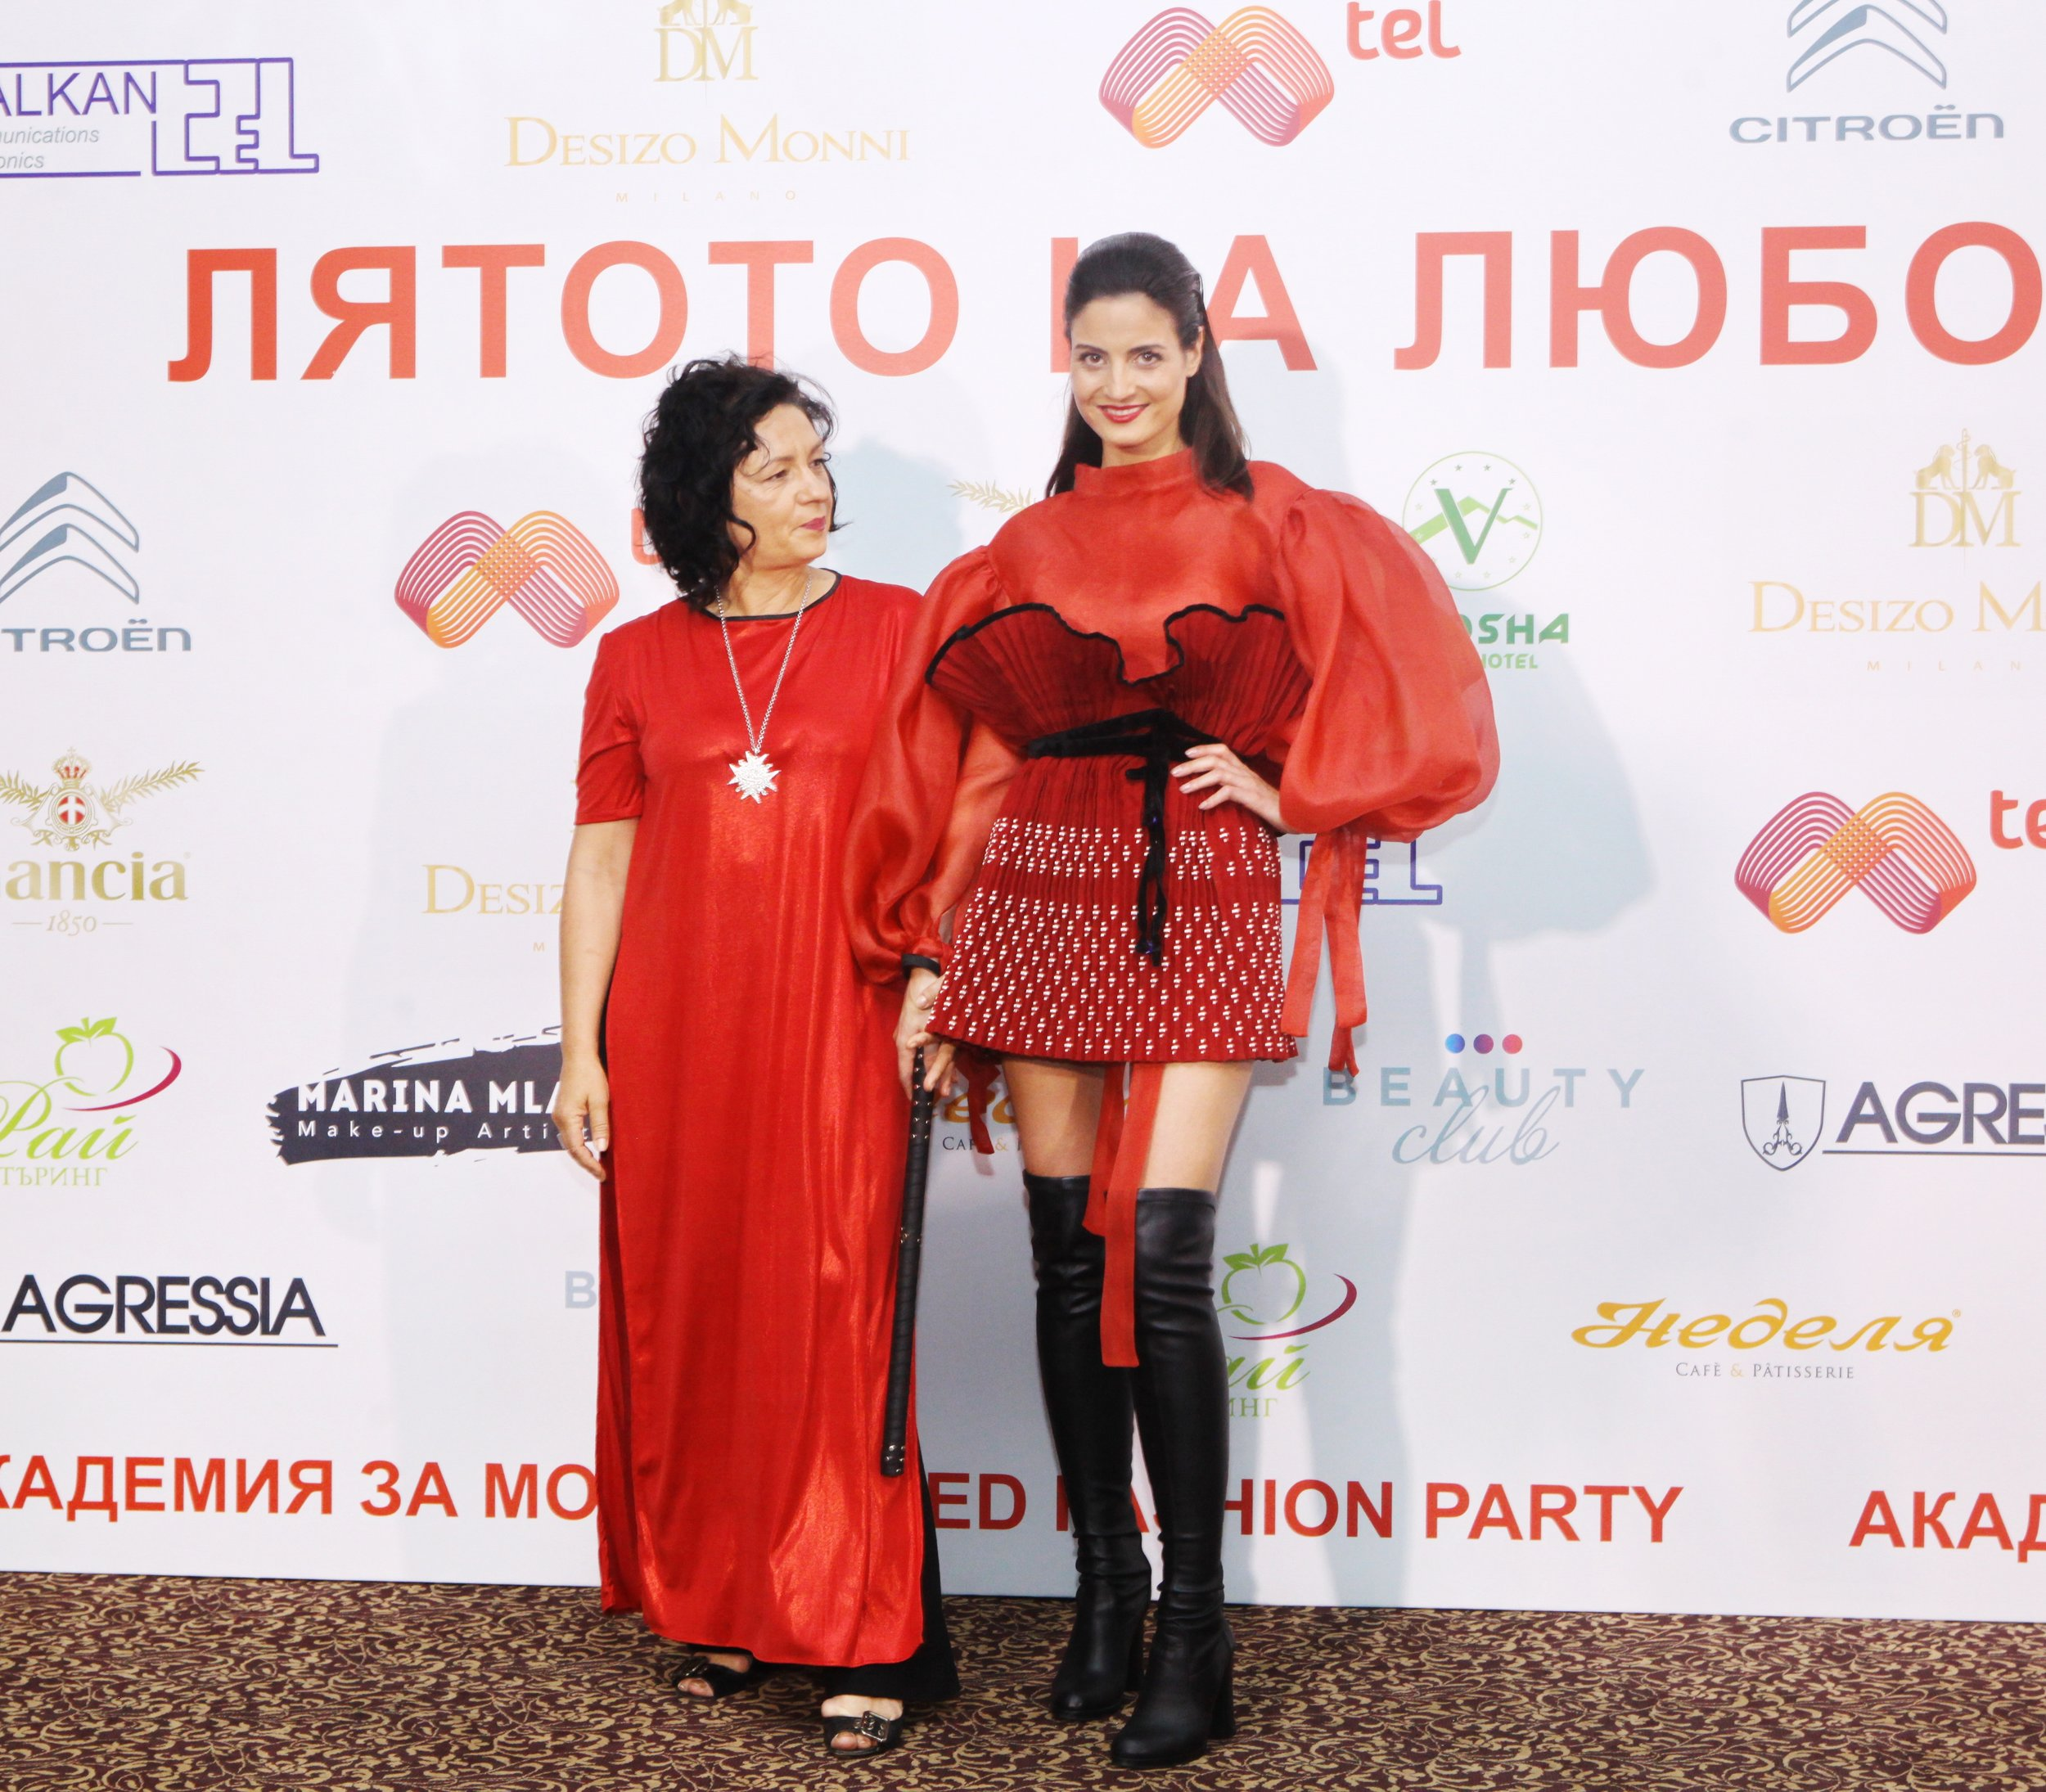 Mariela Gemisheva_Anton Markov.JPG